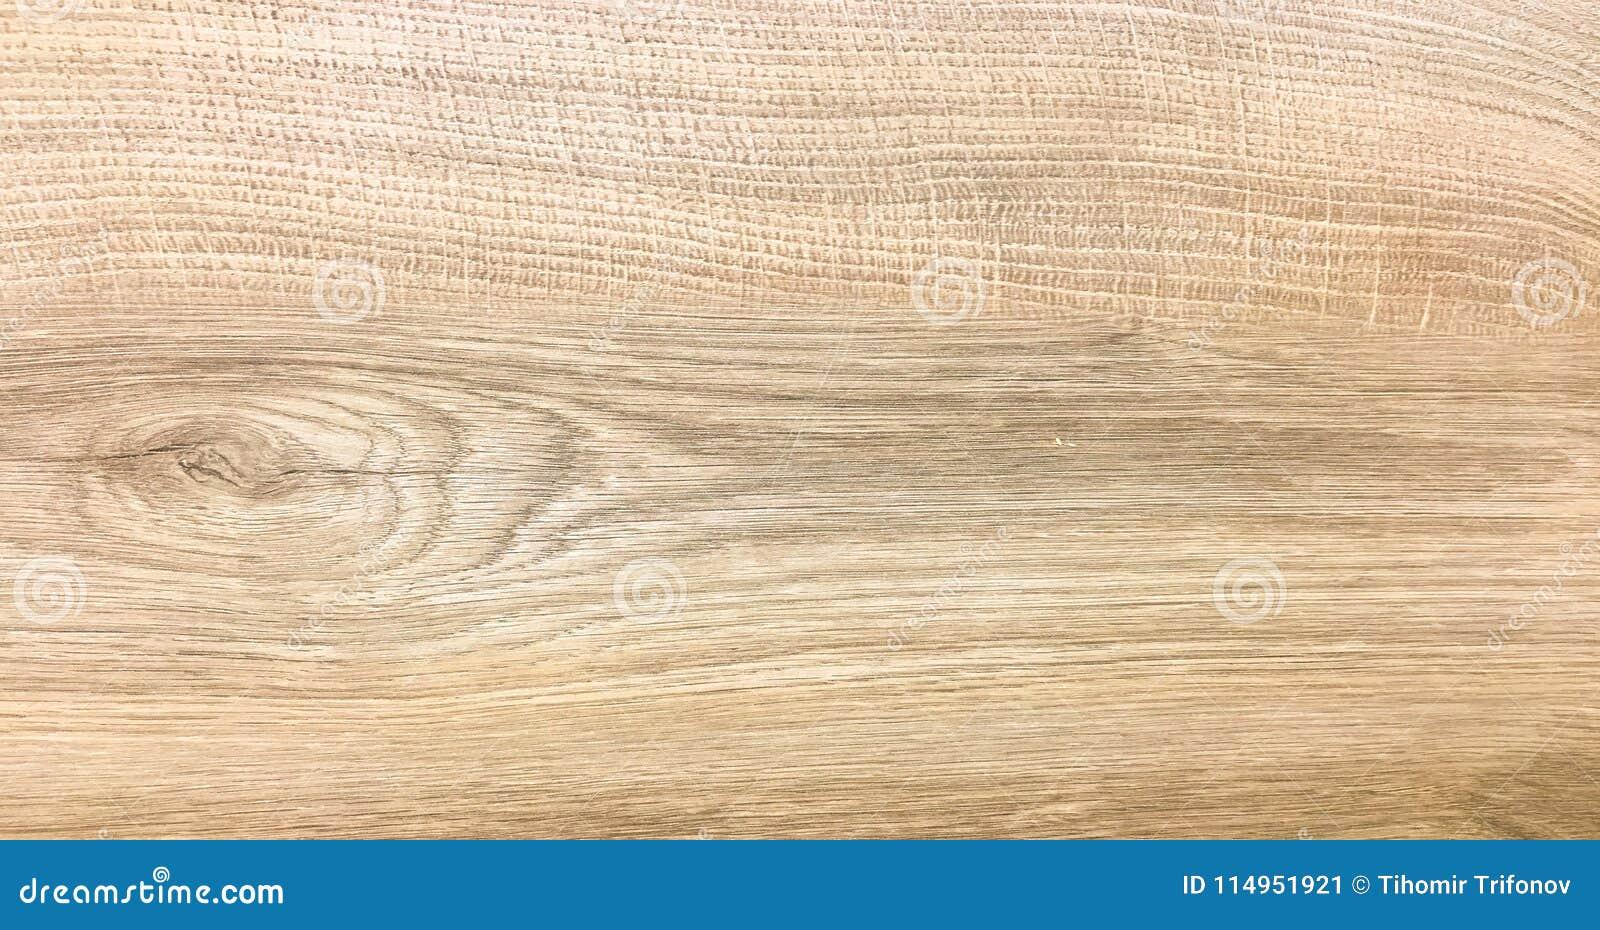 Wood Texture Background Light Oak Wooden Planks Pattern Table Top